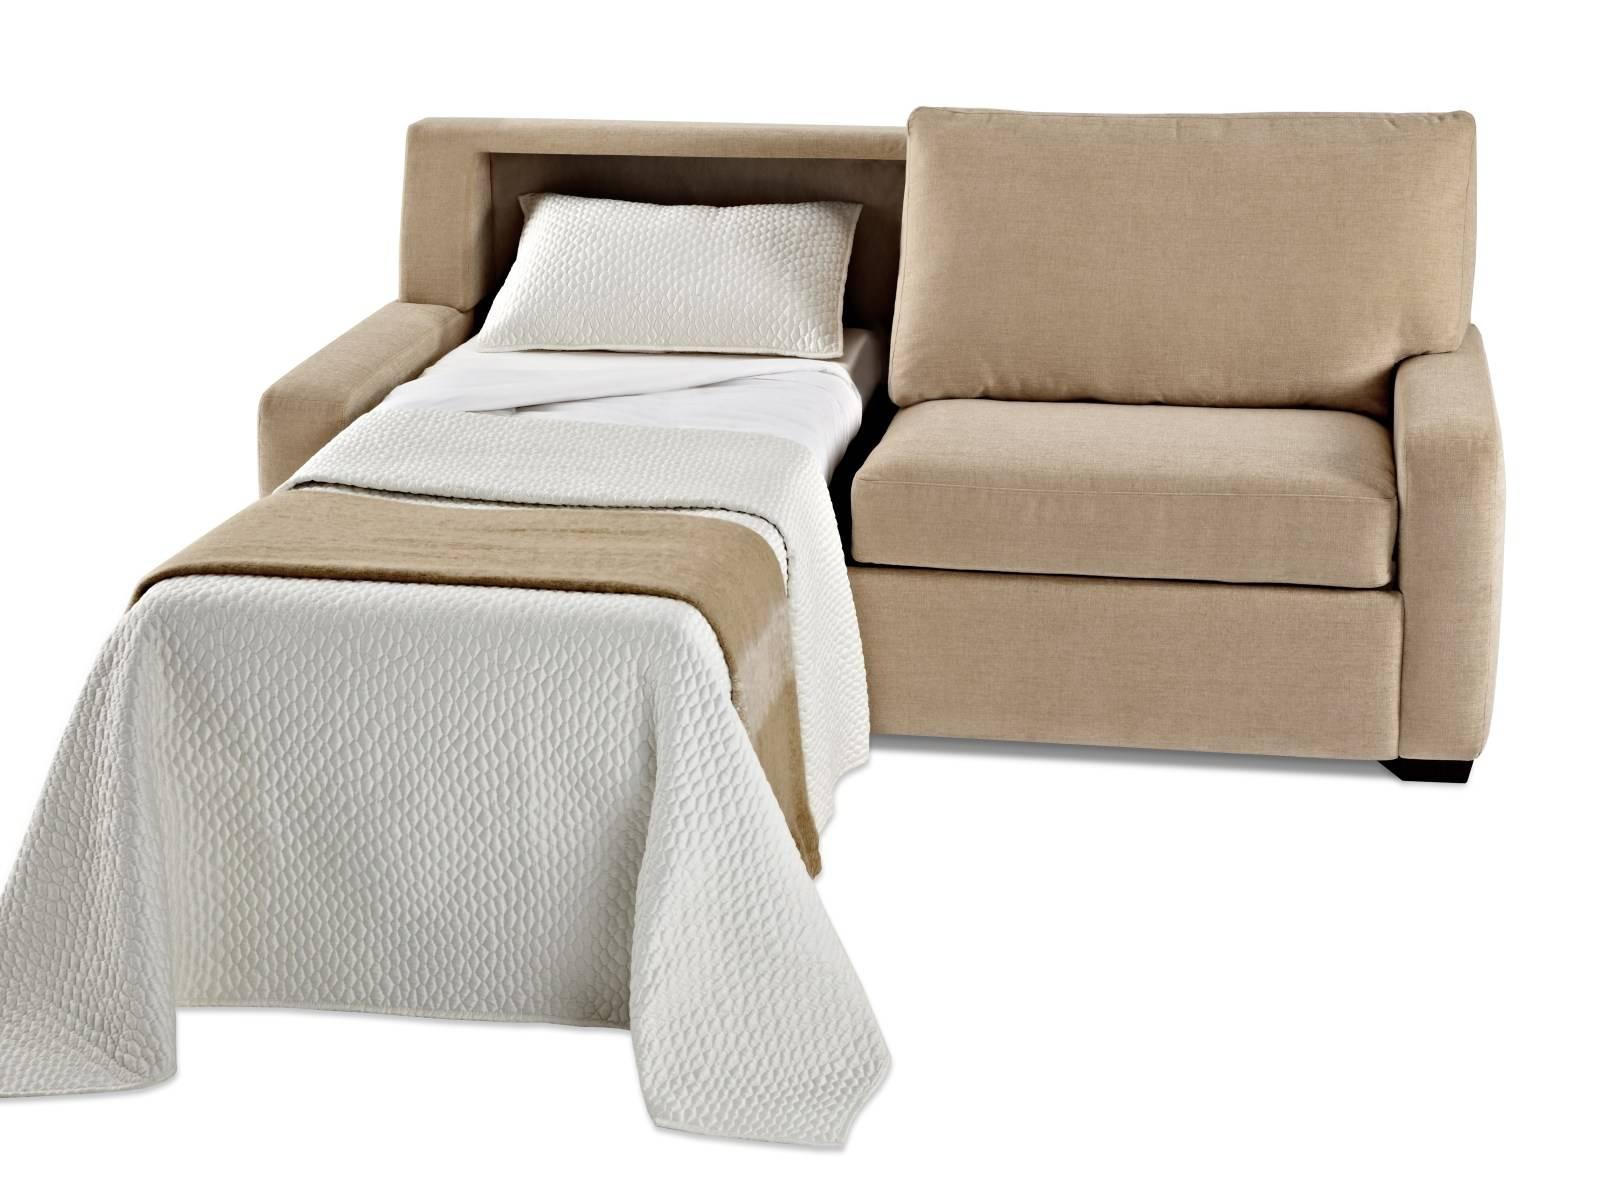 ▻ Sofa : 4 Best Twin Sleeper Sofa Ikea Top Living Room Design for Full Size Sofa Sleepers (Image 29 of 30)